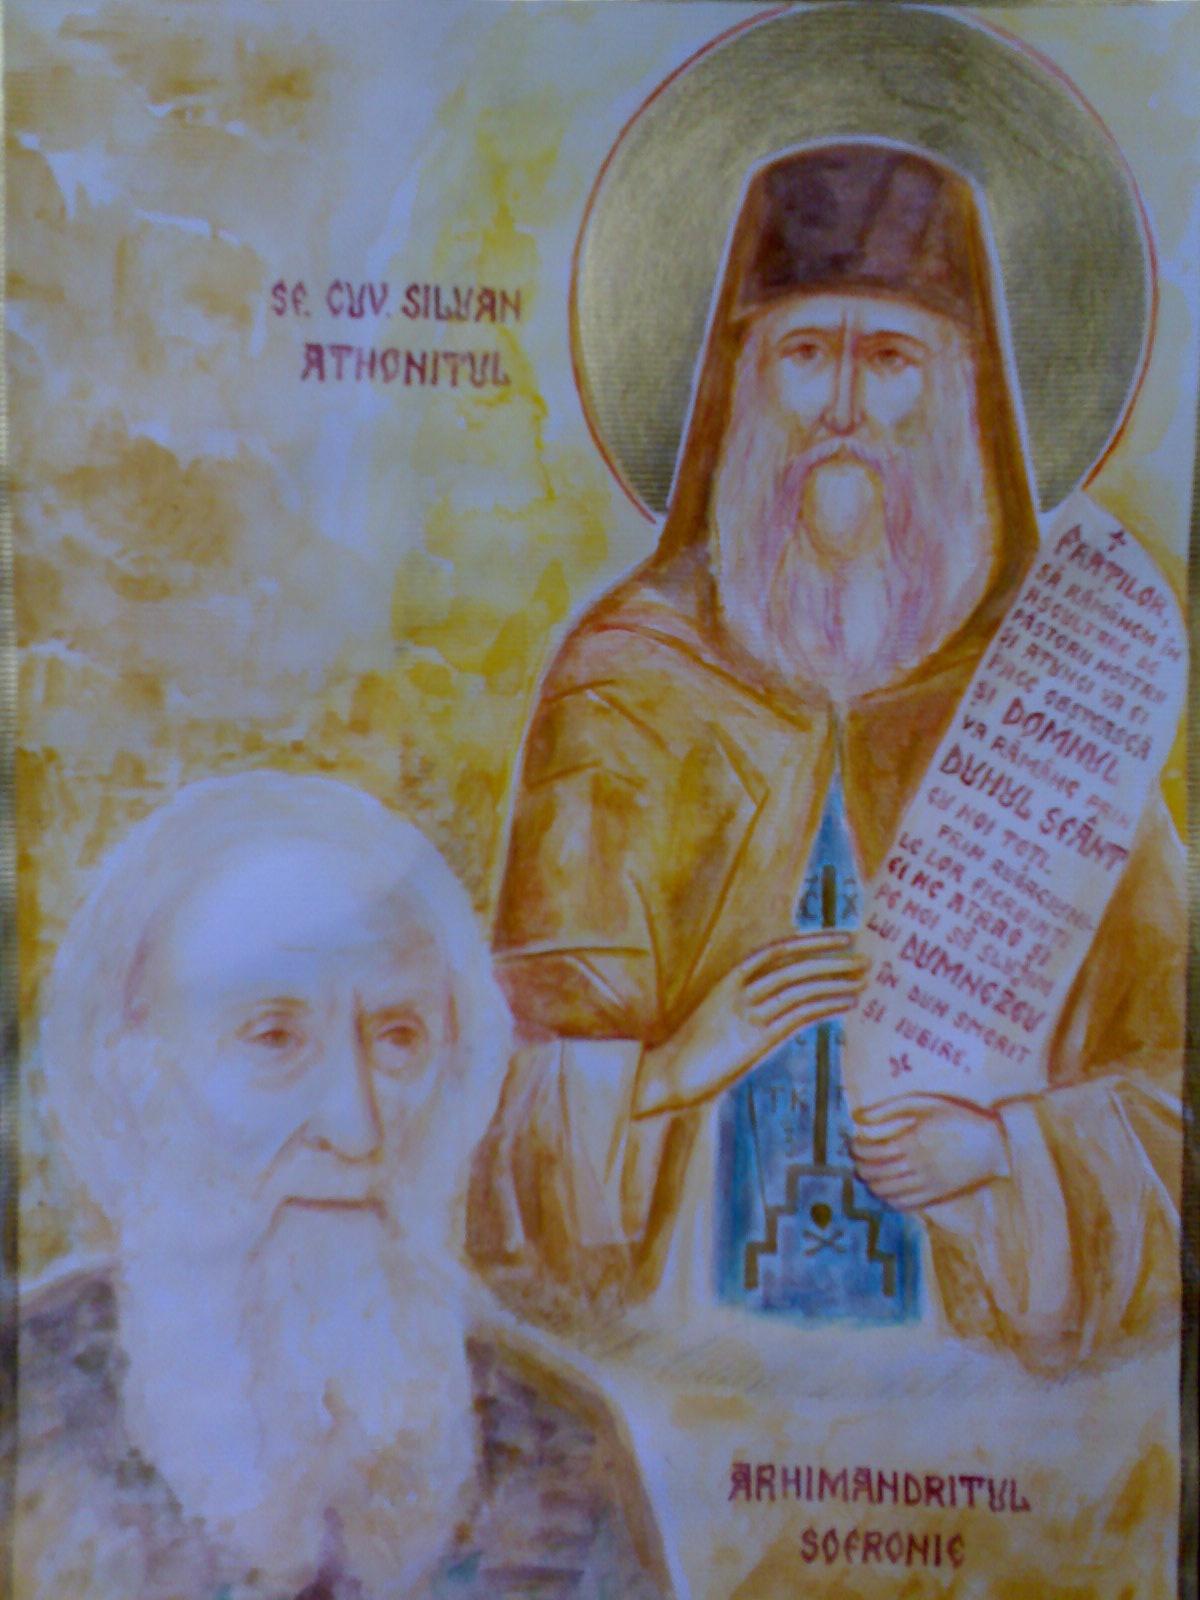 Care e sensul poruncii lui Hristos: <i>&#8220;IUBITI PE VRAJMASII VOSTRI&#8221;</i>?